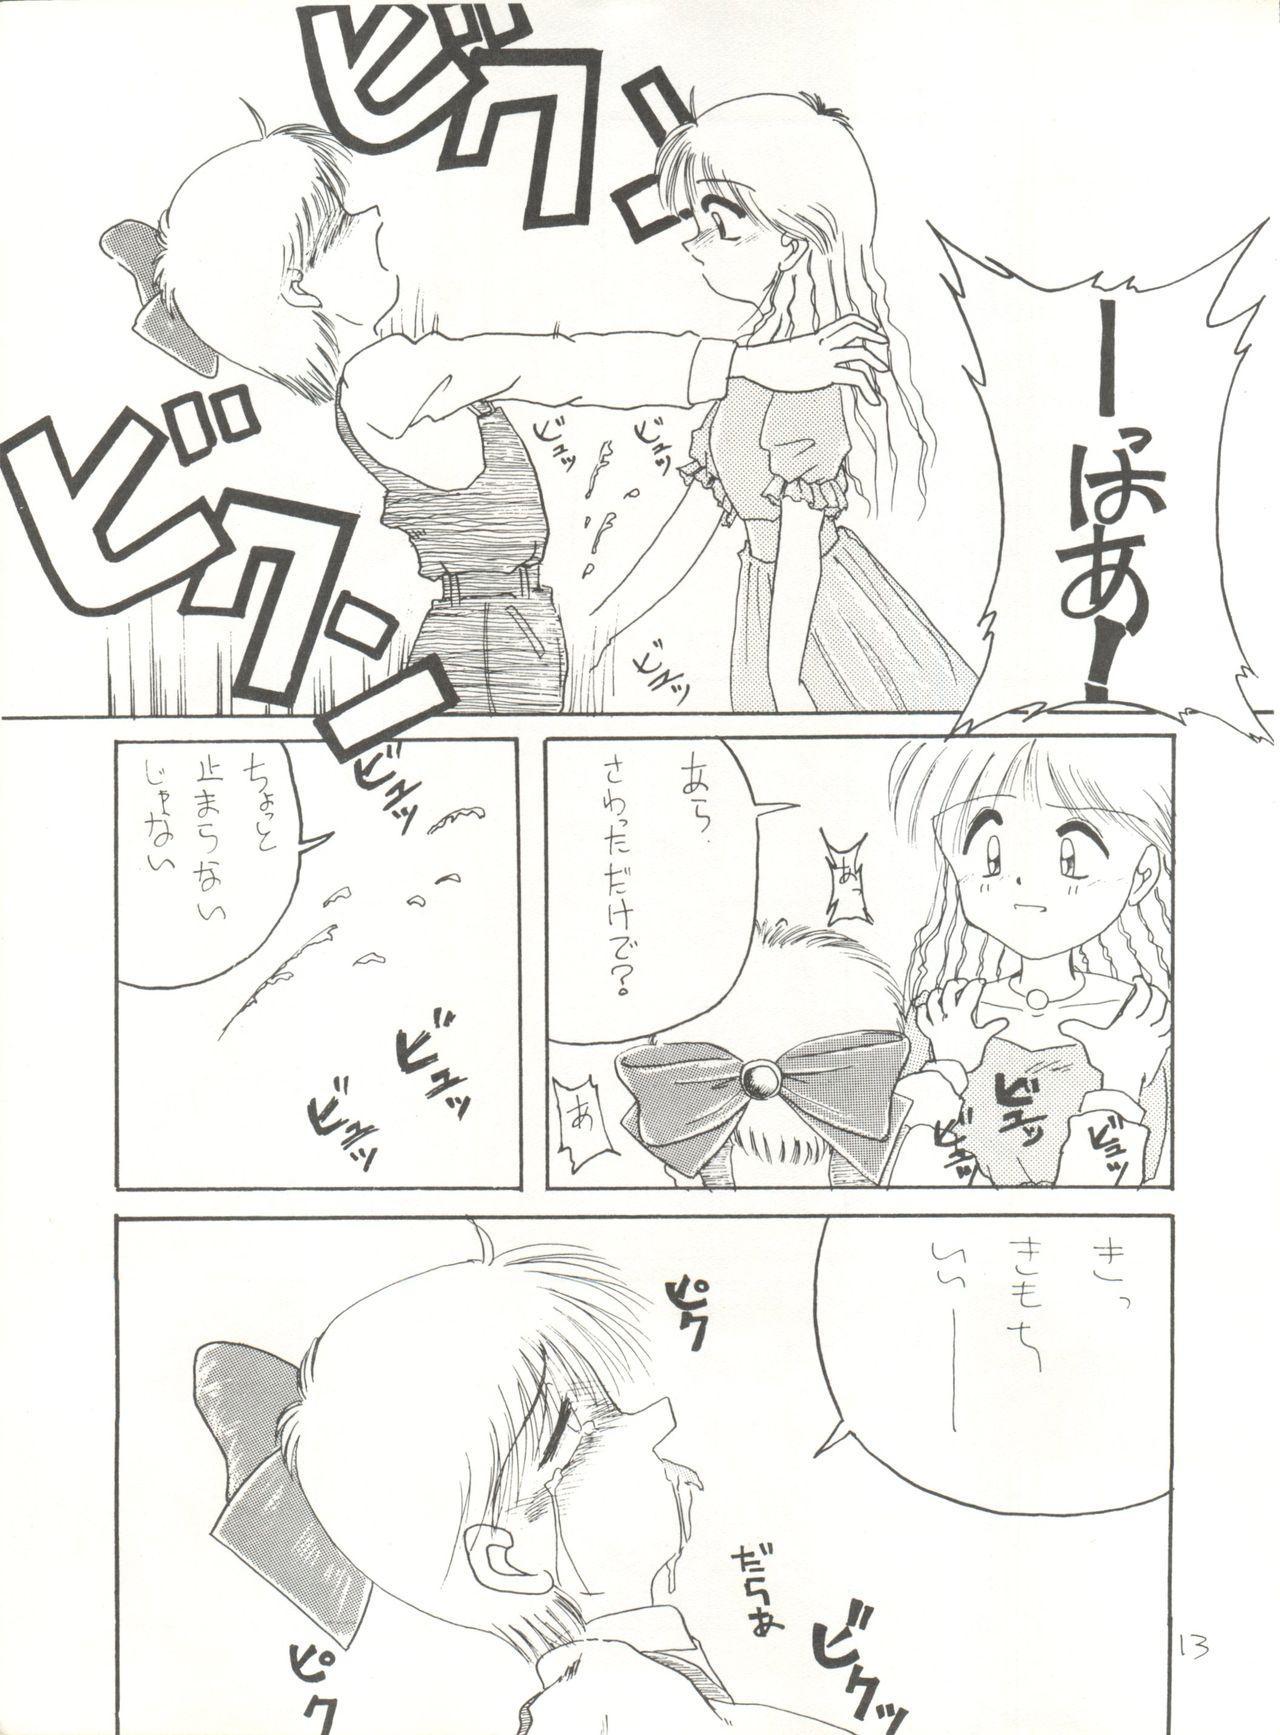 [Global One (MARO)] Sadistic 5 (Cutey Honey, Devilman, Sailor Moon), [Global One (MARO)] Sadistic (Dirty Pair, Fushigi no Umi no Nadia, Sailor Moon), [Studio Ikkatsumajin] .ribbon (Hime-chan's Ribbon) 136